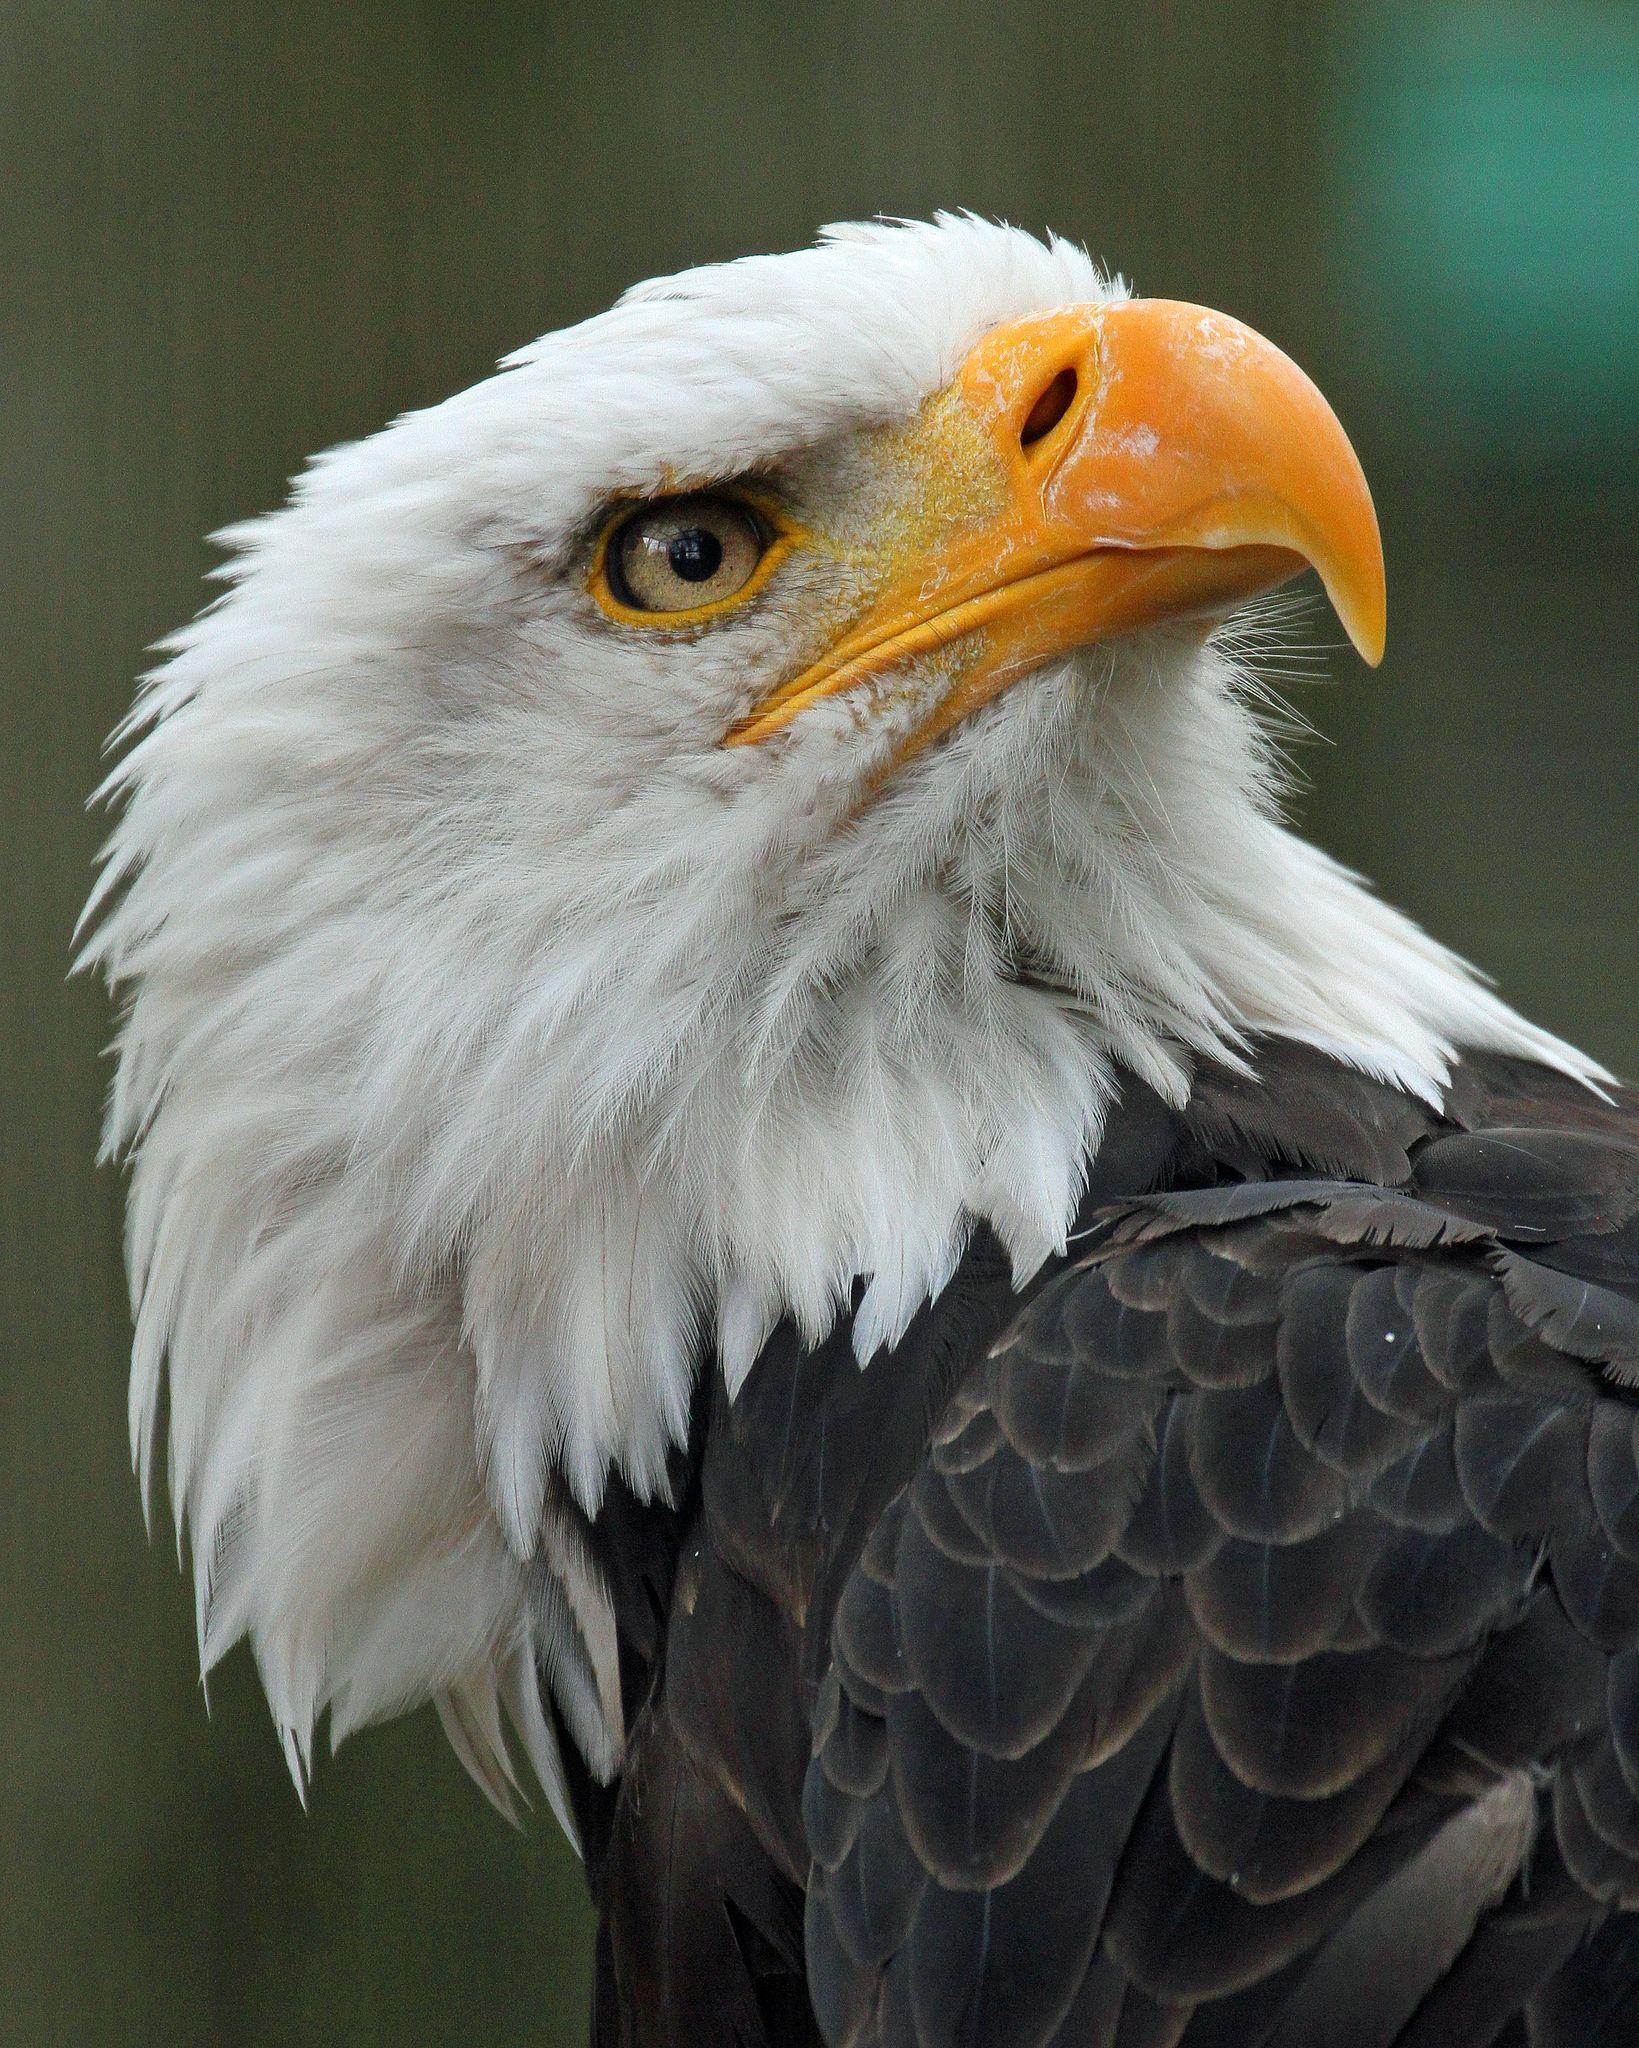 American Bald Eagle - \'Devil in Feathers\'   Ave, Animales y Águila calva